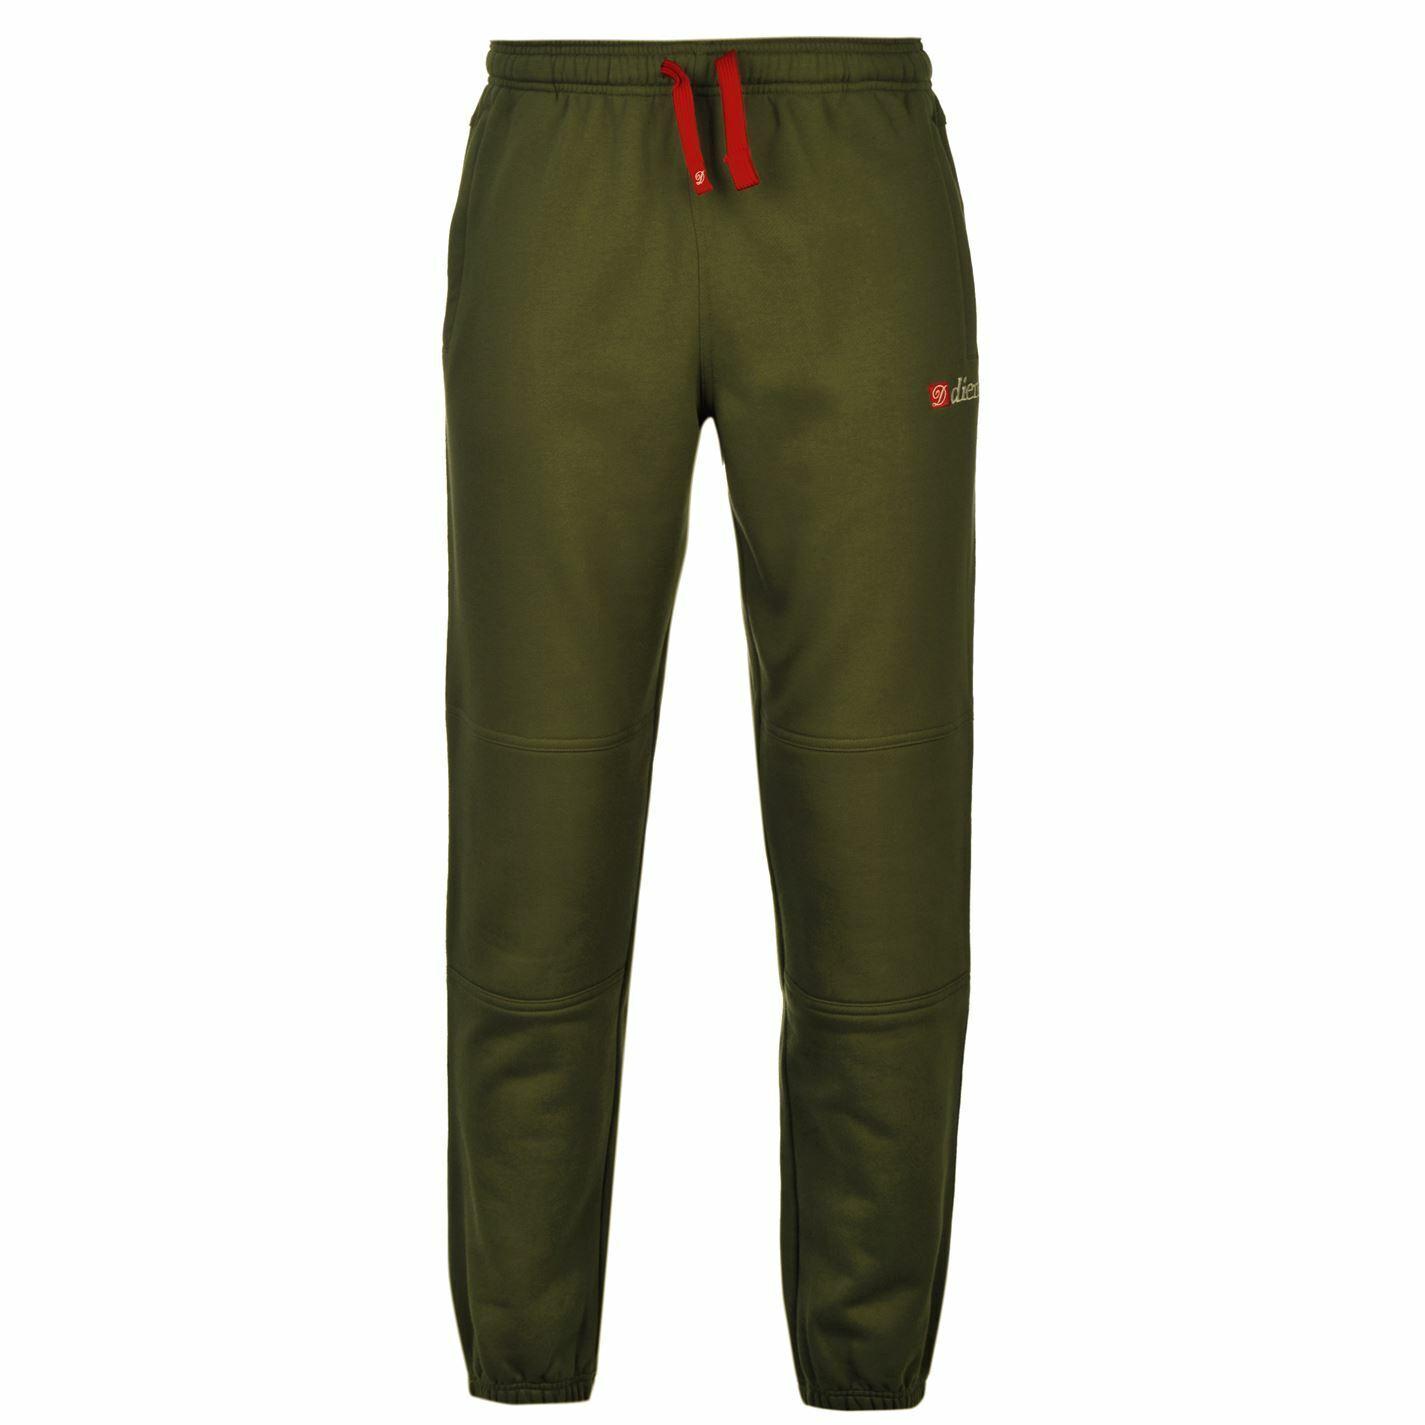 Diem Mens All Terrain Joggers Fishing Trousers Bottoms Pants Clothing Wear